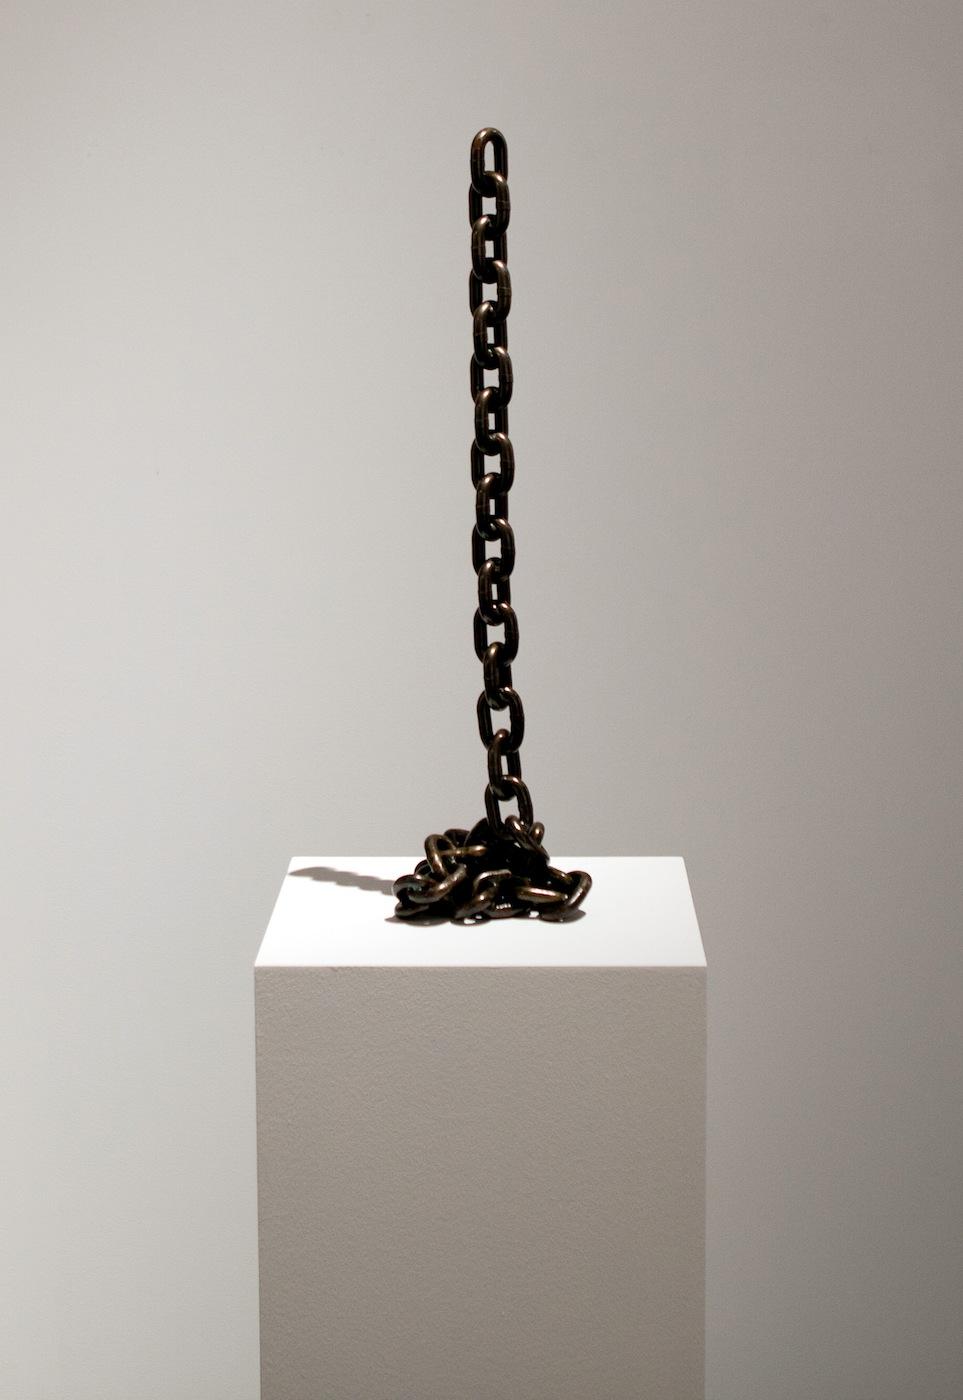 Judith Hopf  Endings 2011 Iron, Varnish  100 cm tall